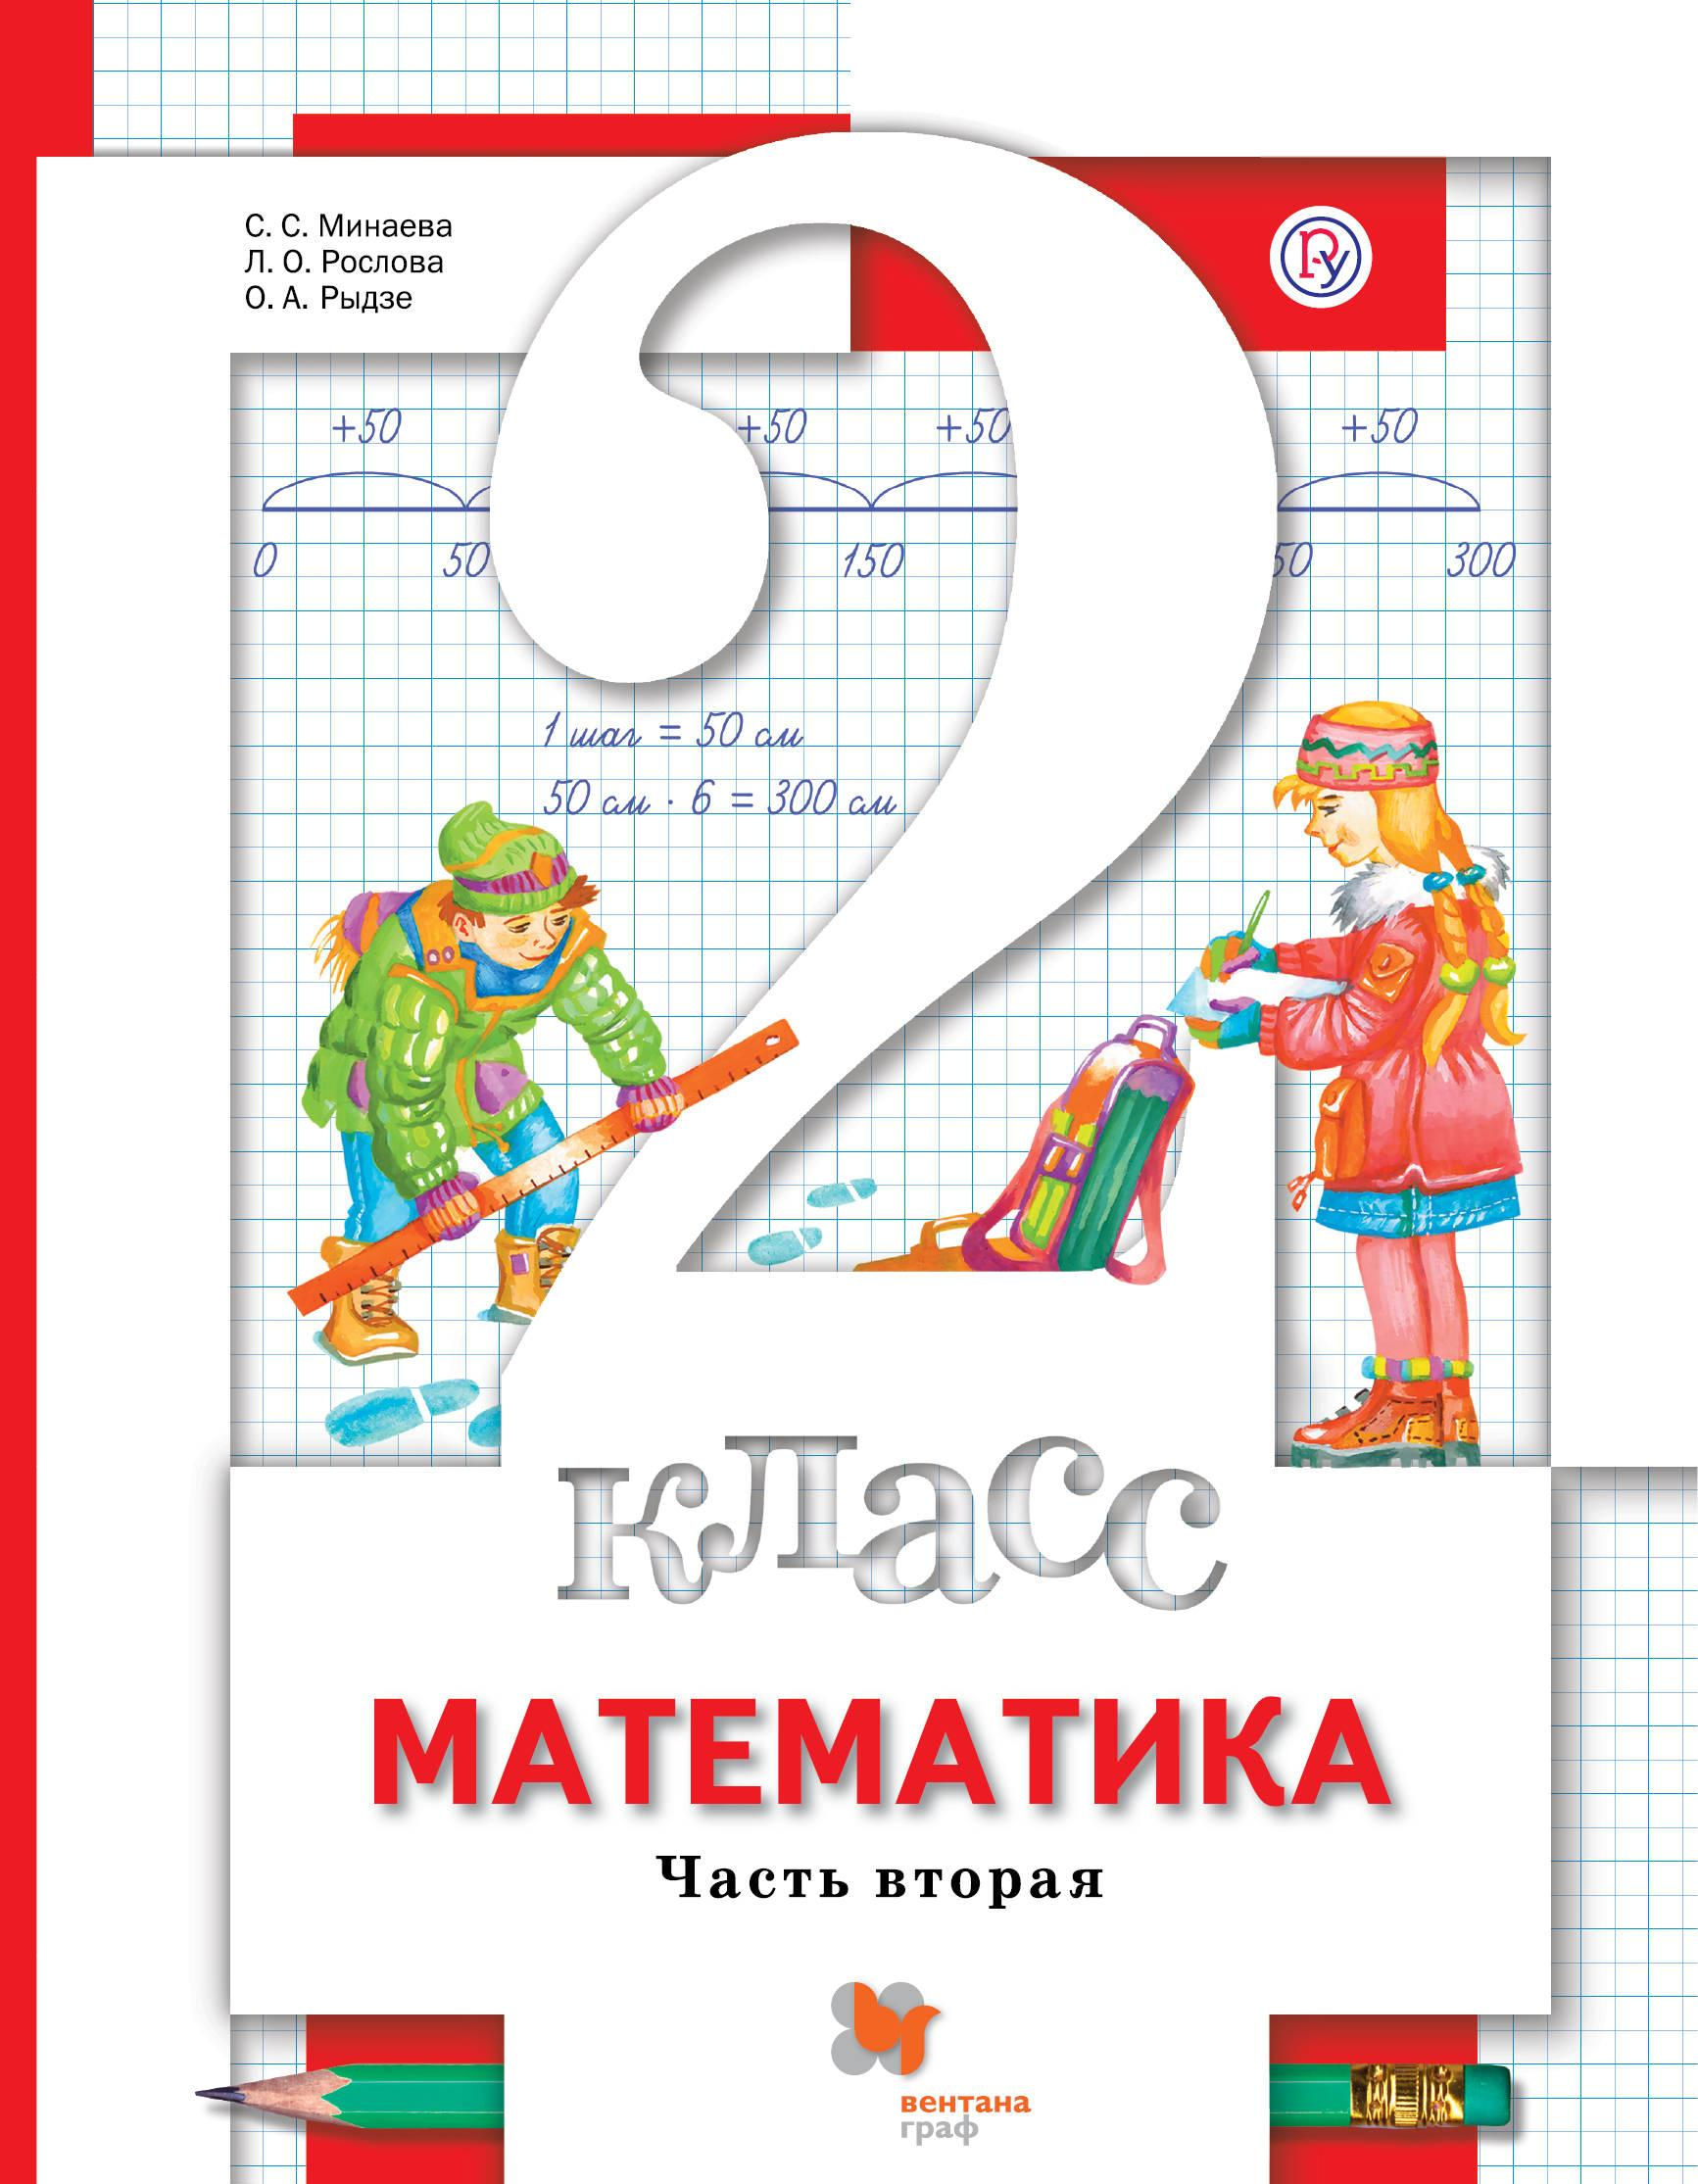 Matematika. 2 klass. Uchebnik. V 2 chastjakh. Chast 2